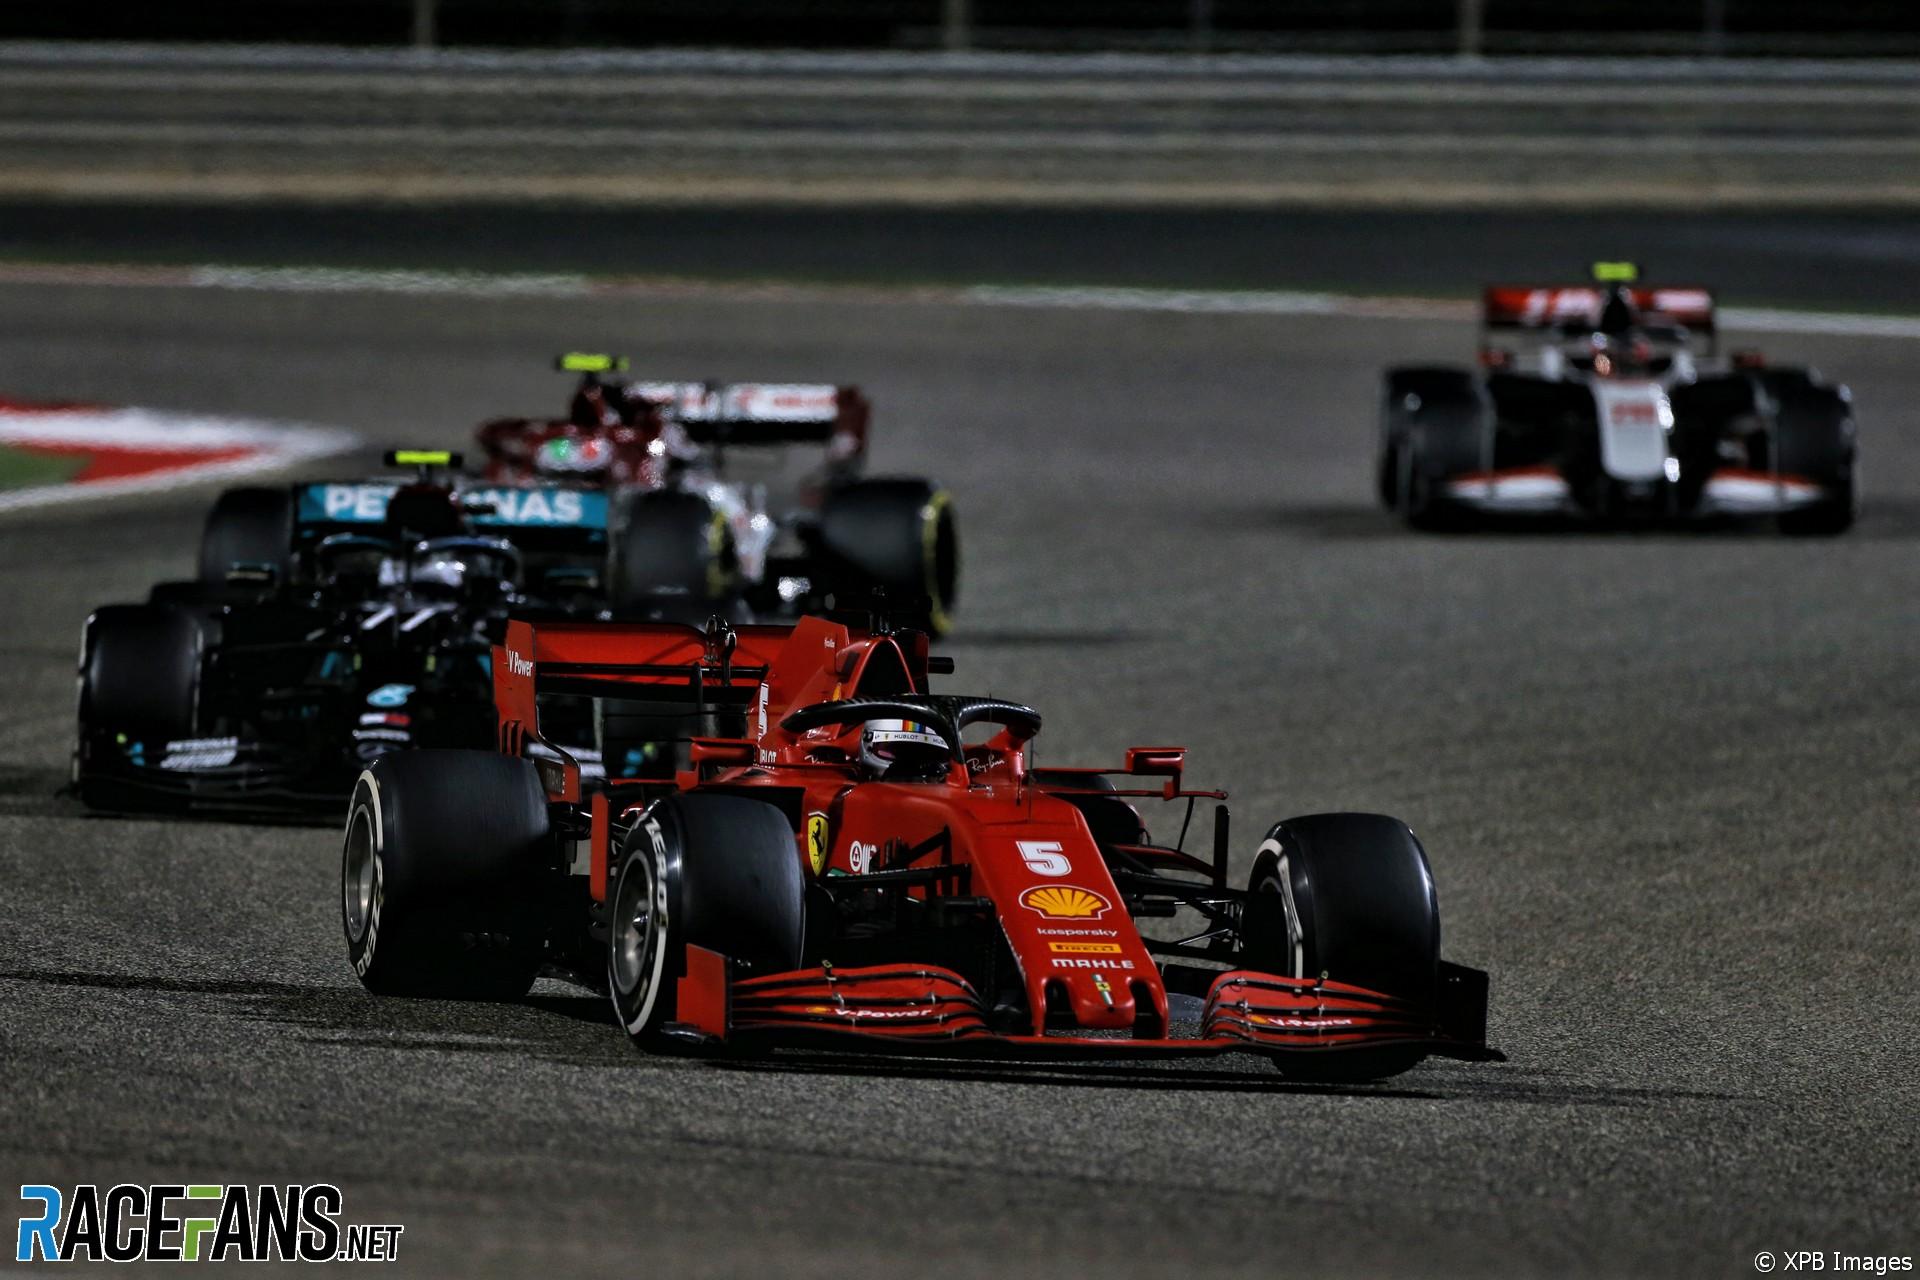 Sebastian Vettel, Ferrari, Bahrain International Circuit, 2020